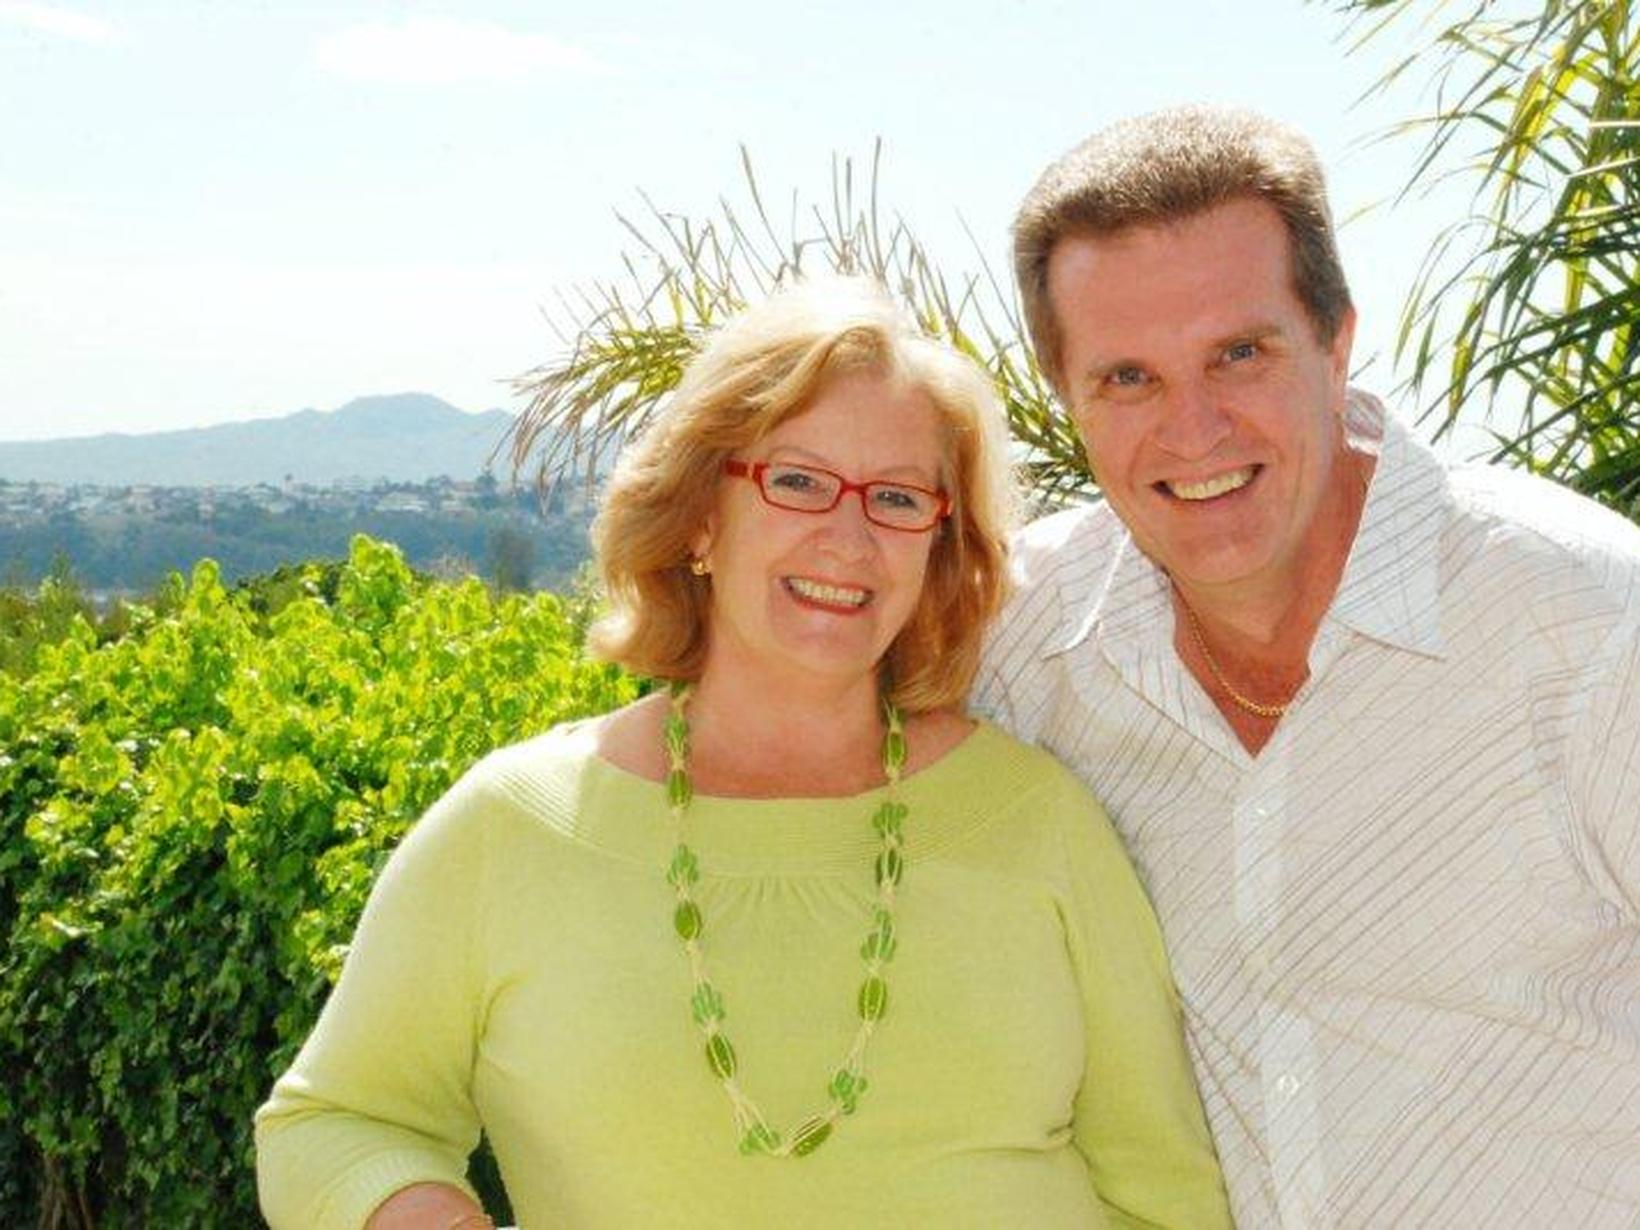 Eileen & Mark from Melbourne, Victoria, Australia